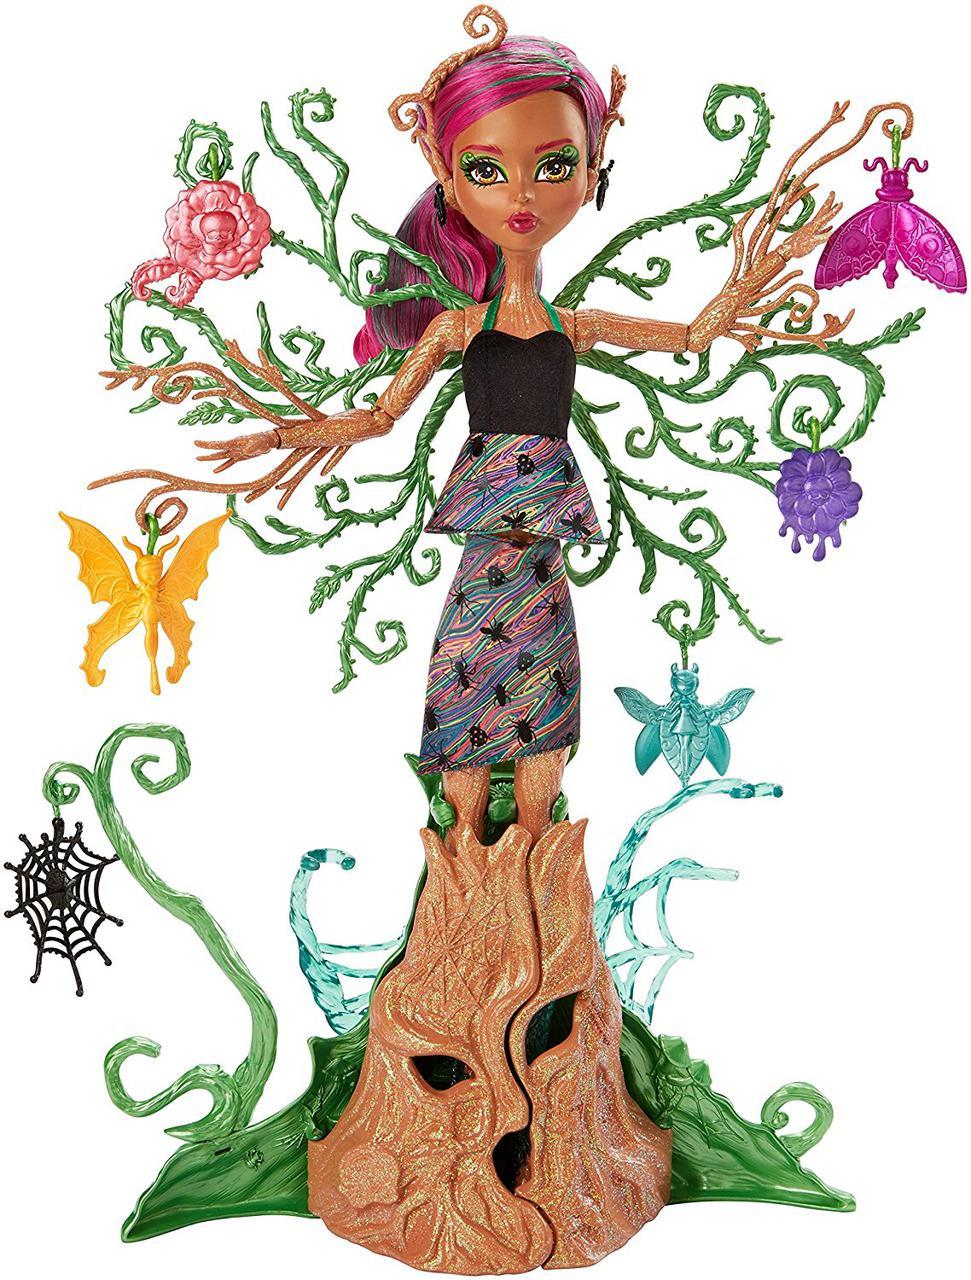 Кукла Монстер Хай Триза Торнвиллоу Садовые Монстры Monster High Garden Ghouls Treesa Thornwillow